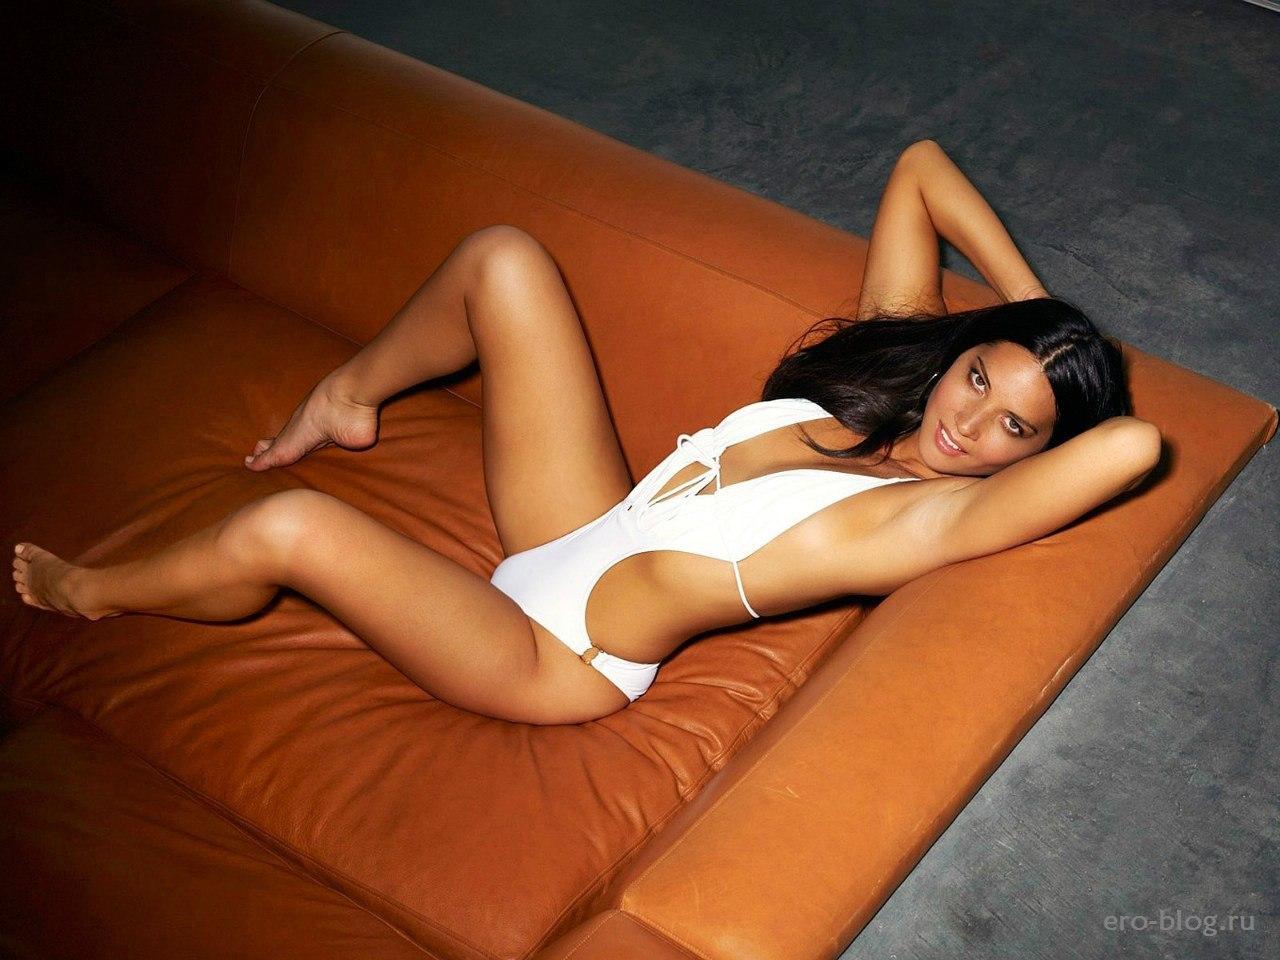 Голая обнаженная Olivia Munn | Оливия Манн интимные фото звезды